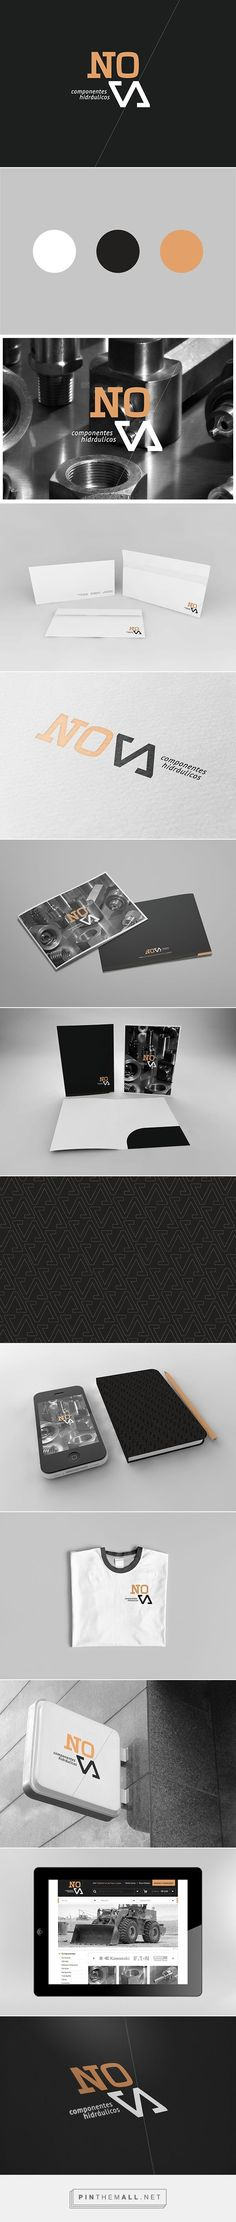 Nova Corporate Identity on Behance   Fivestar Branding – Design and Branding Agency & Inspiration Gallery